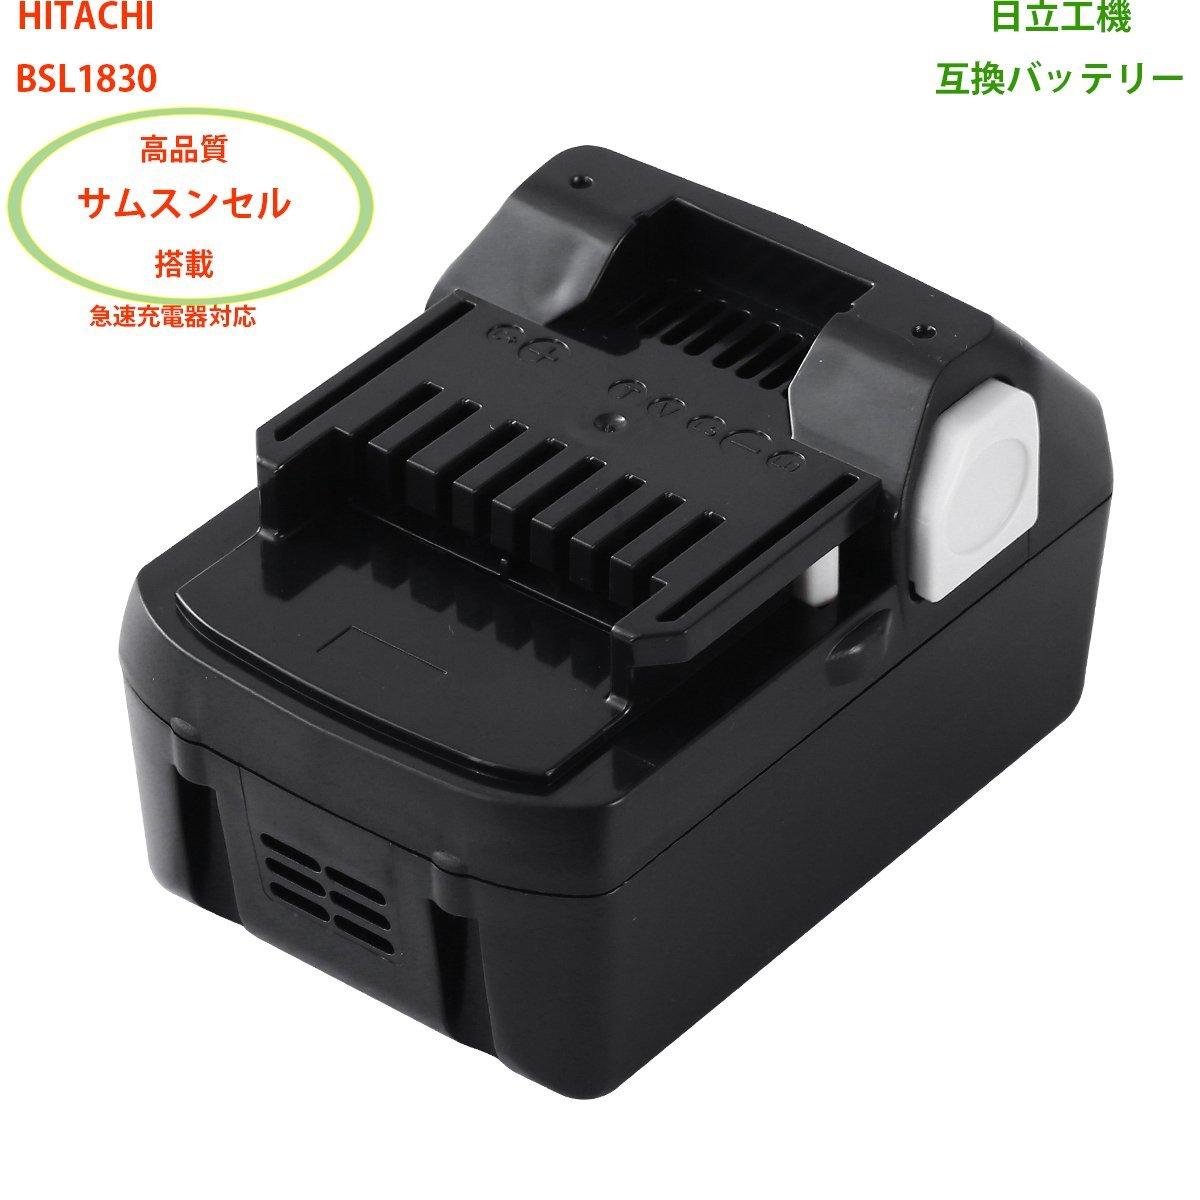 (Hitachi)日立 BSL1830 互換バッテリー